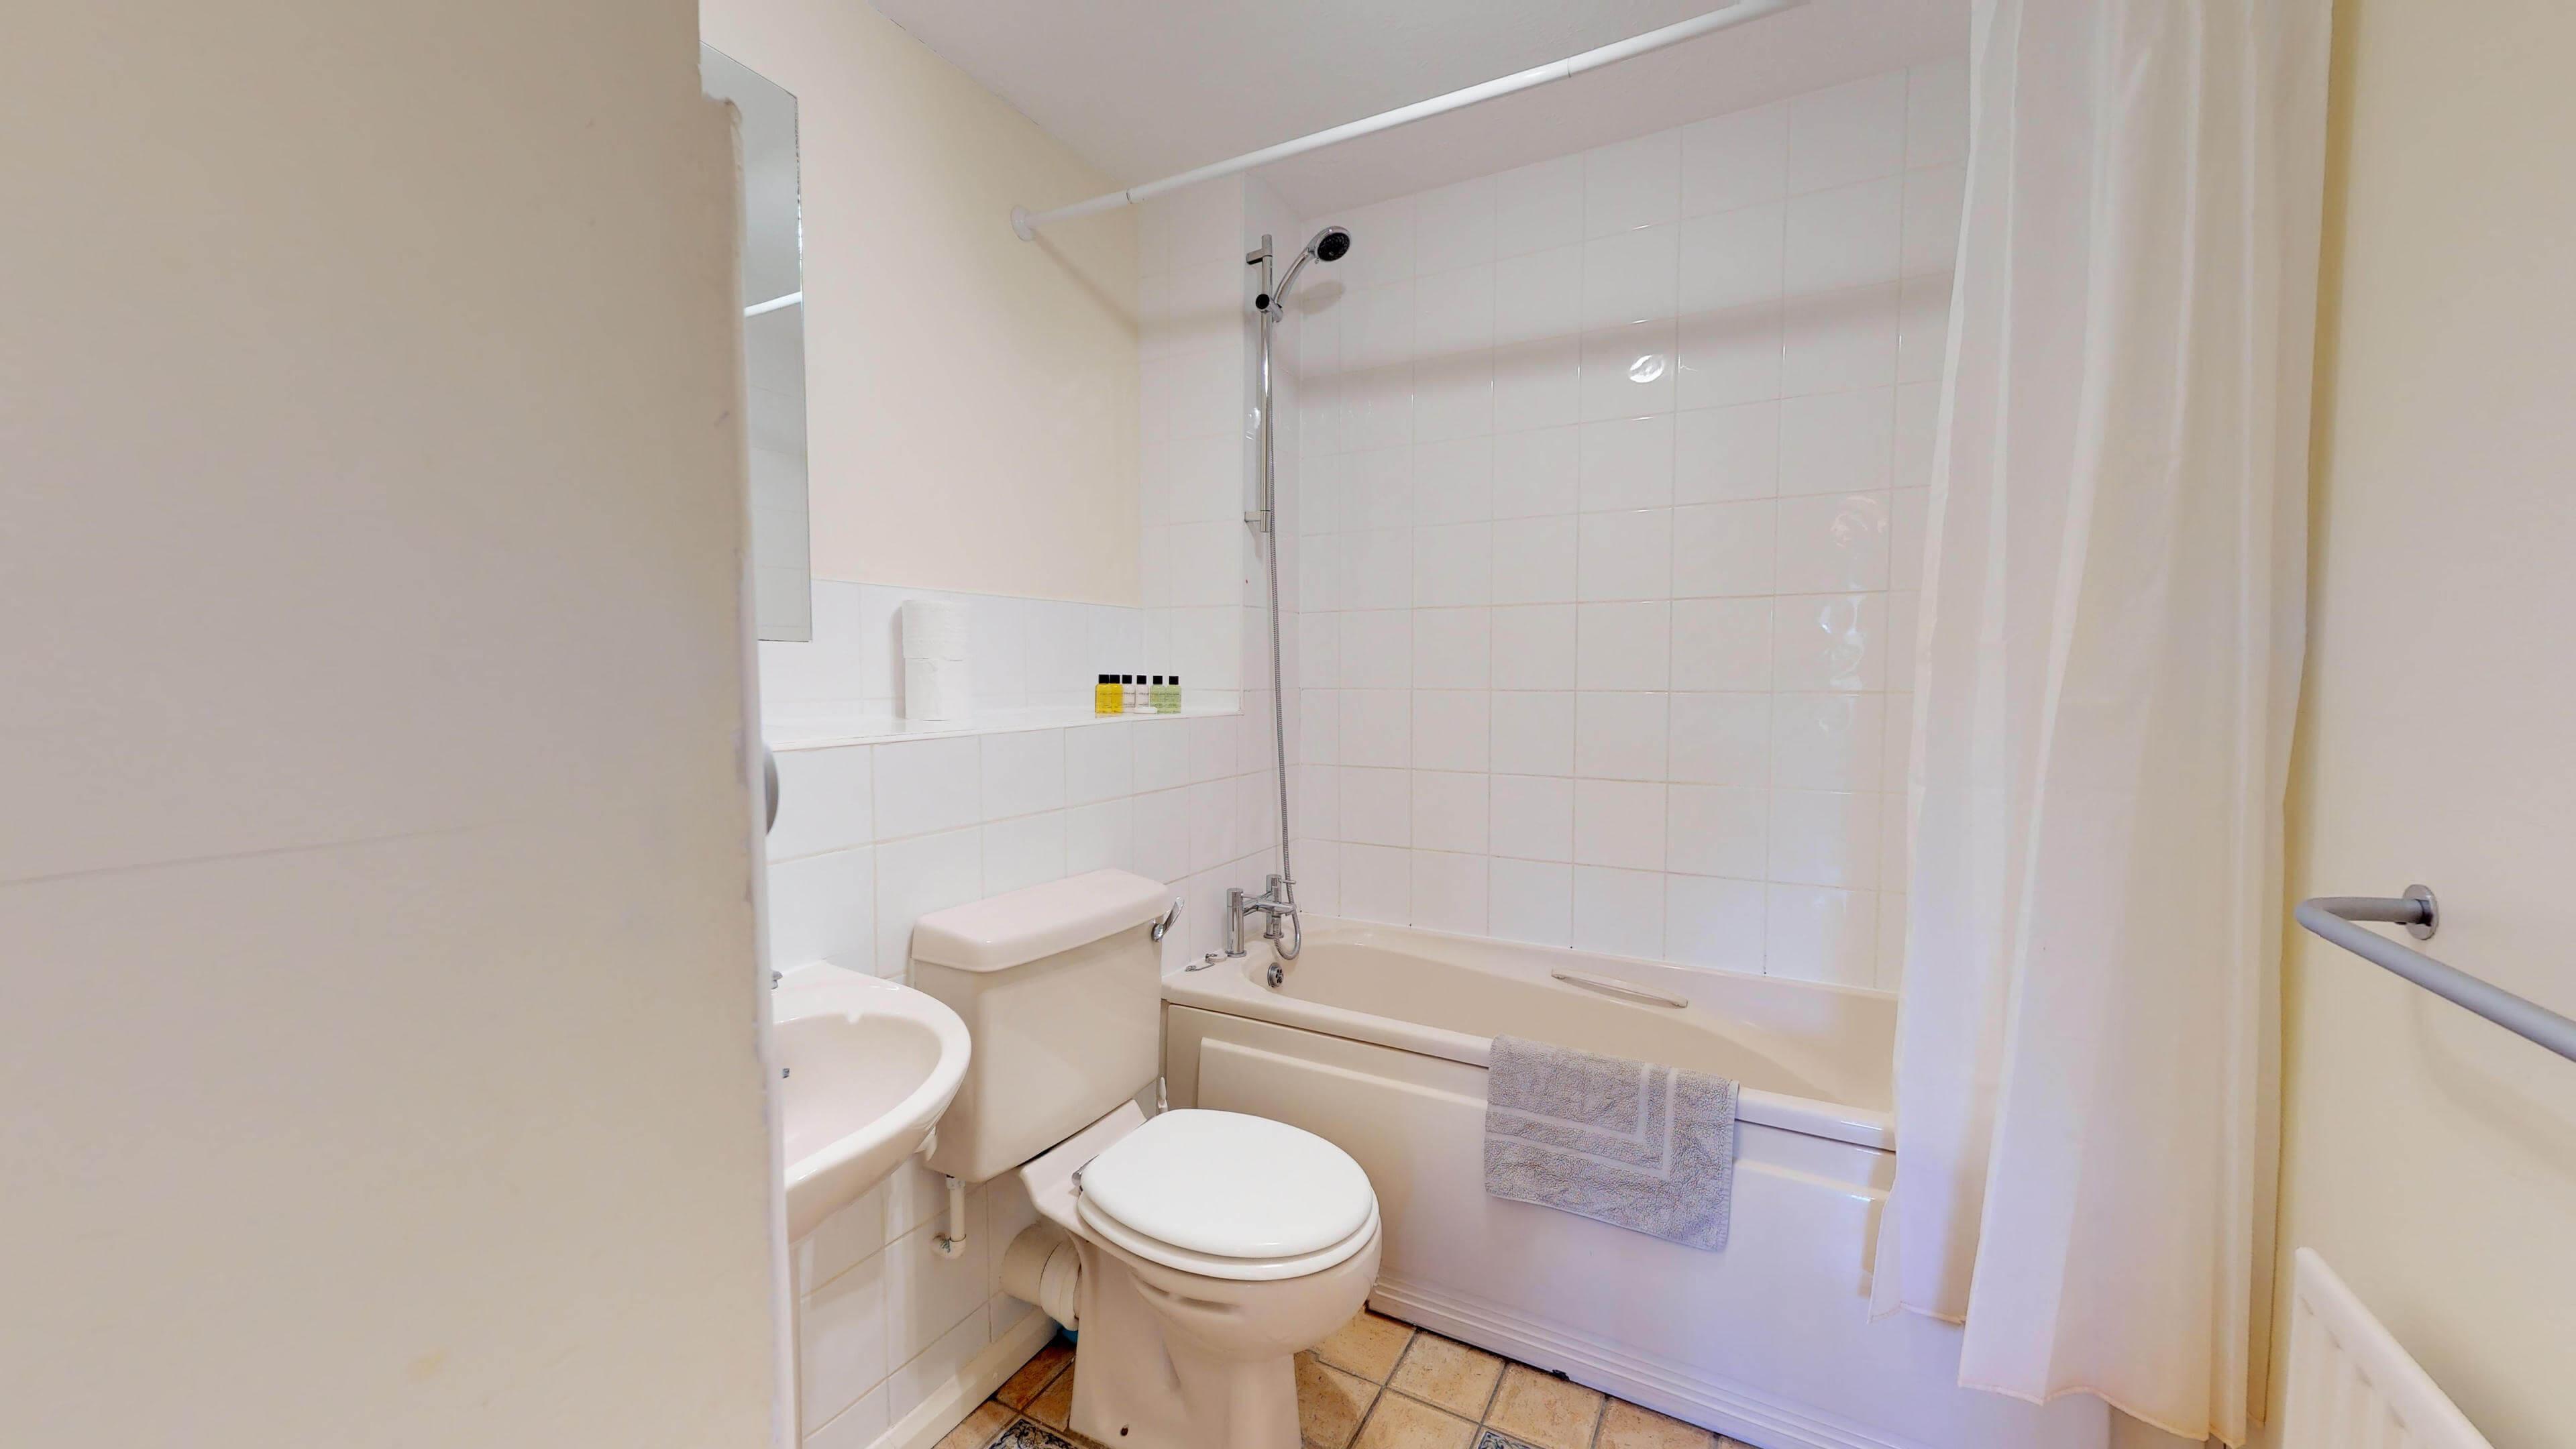 Millbank Oxford City Centre Short Stay Apartment Sleeps 4 Bathroom